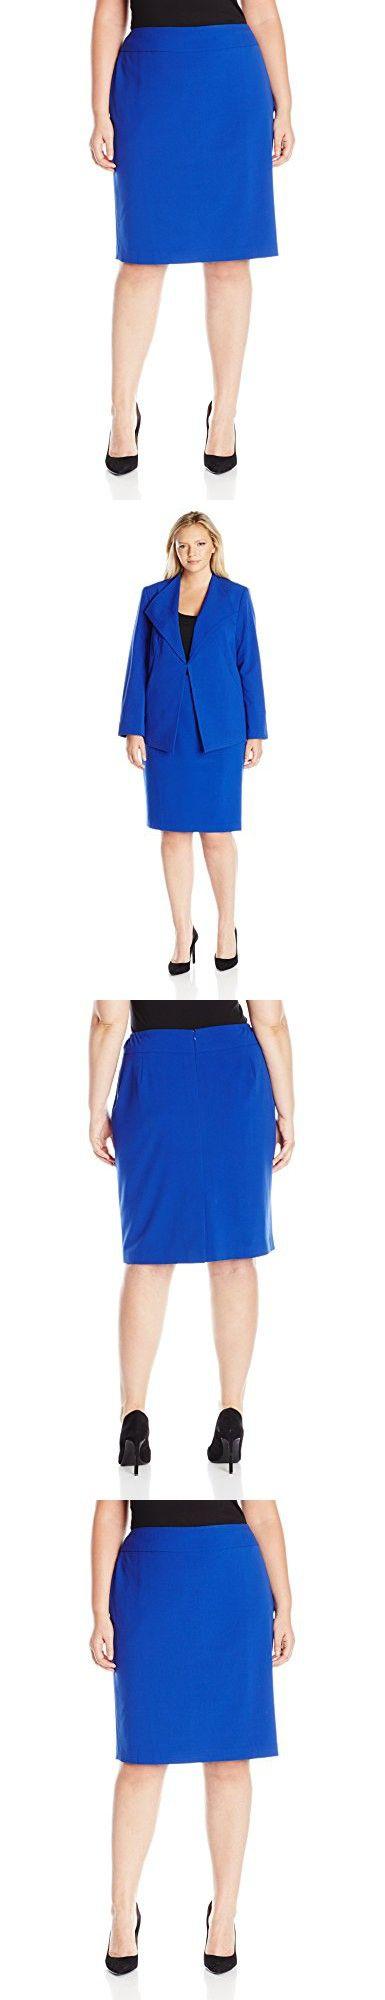 Nine West Women's Plus Size Straight Skirt, Royal, 24W